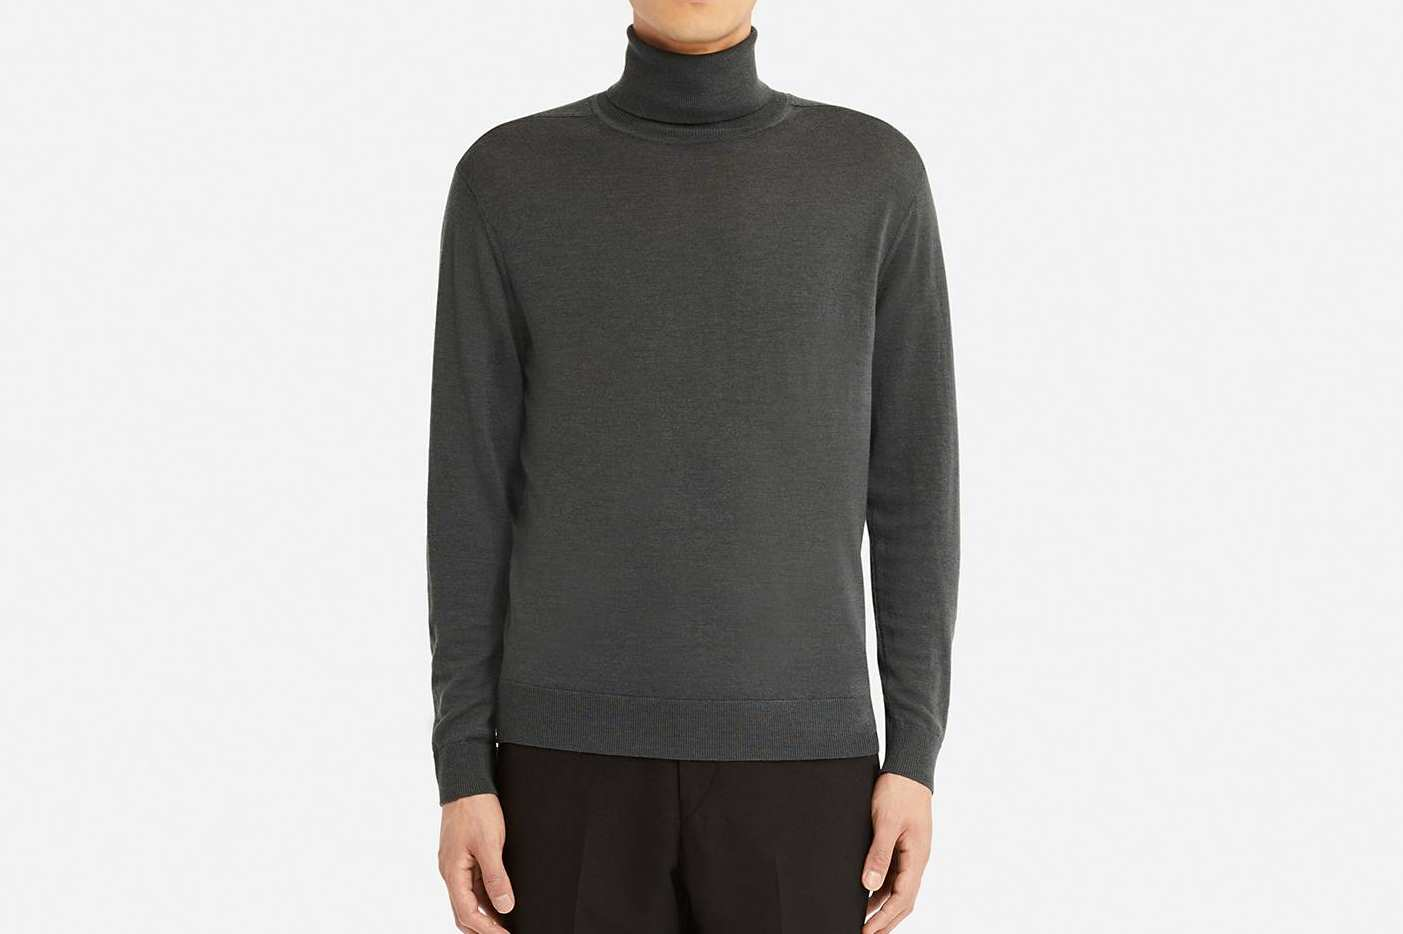 Uniqlo Men's U Extra Fine Merino Turtleneck Long Sleeve Sweater